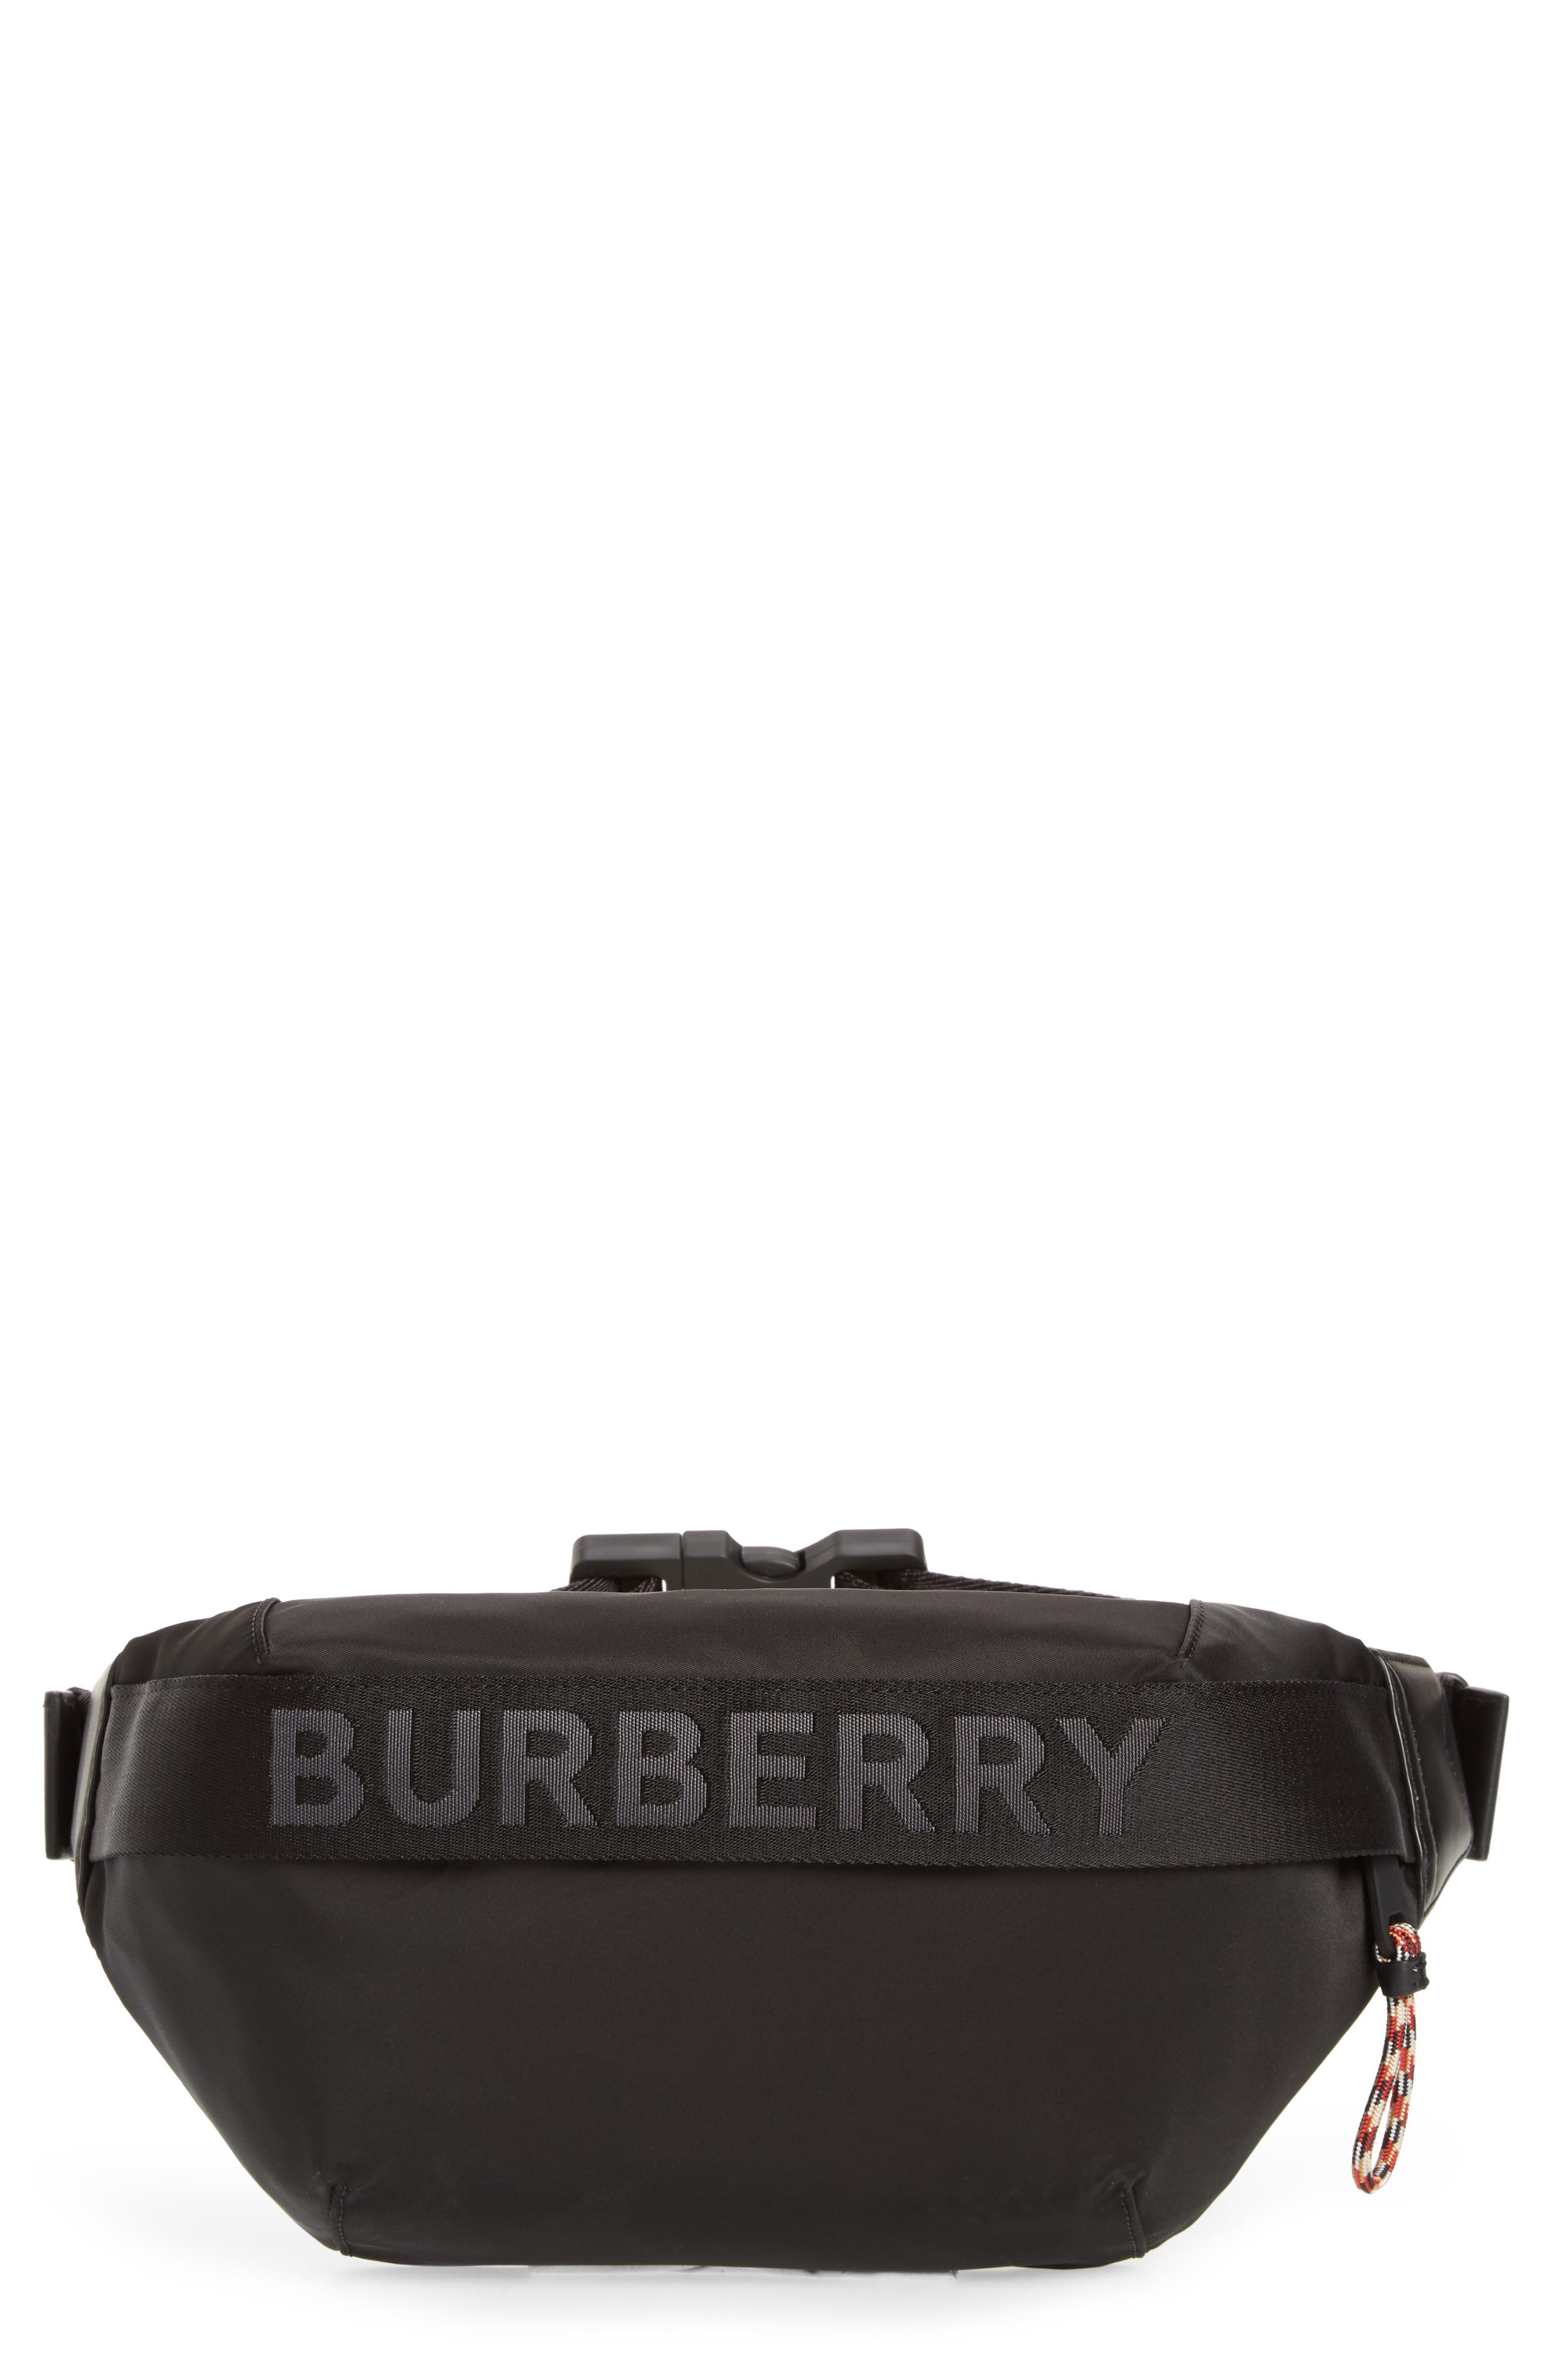 BURBERRY, Medium Sonny Logo Belt Bag, Main thumbnail 1, color, BLACK